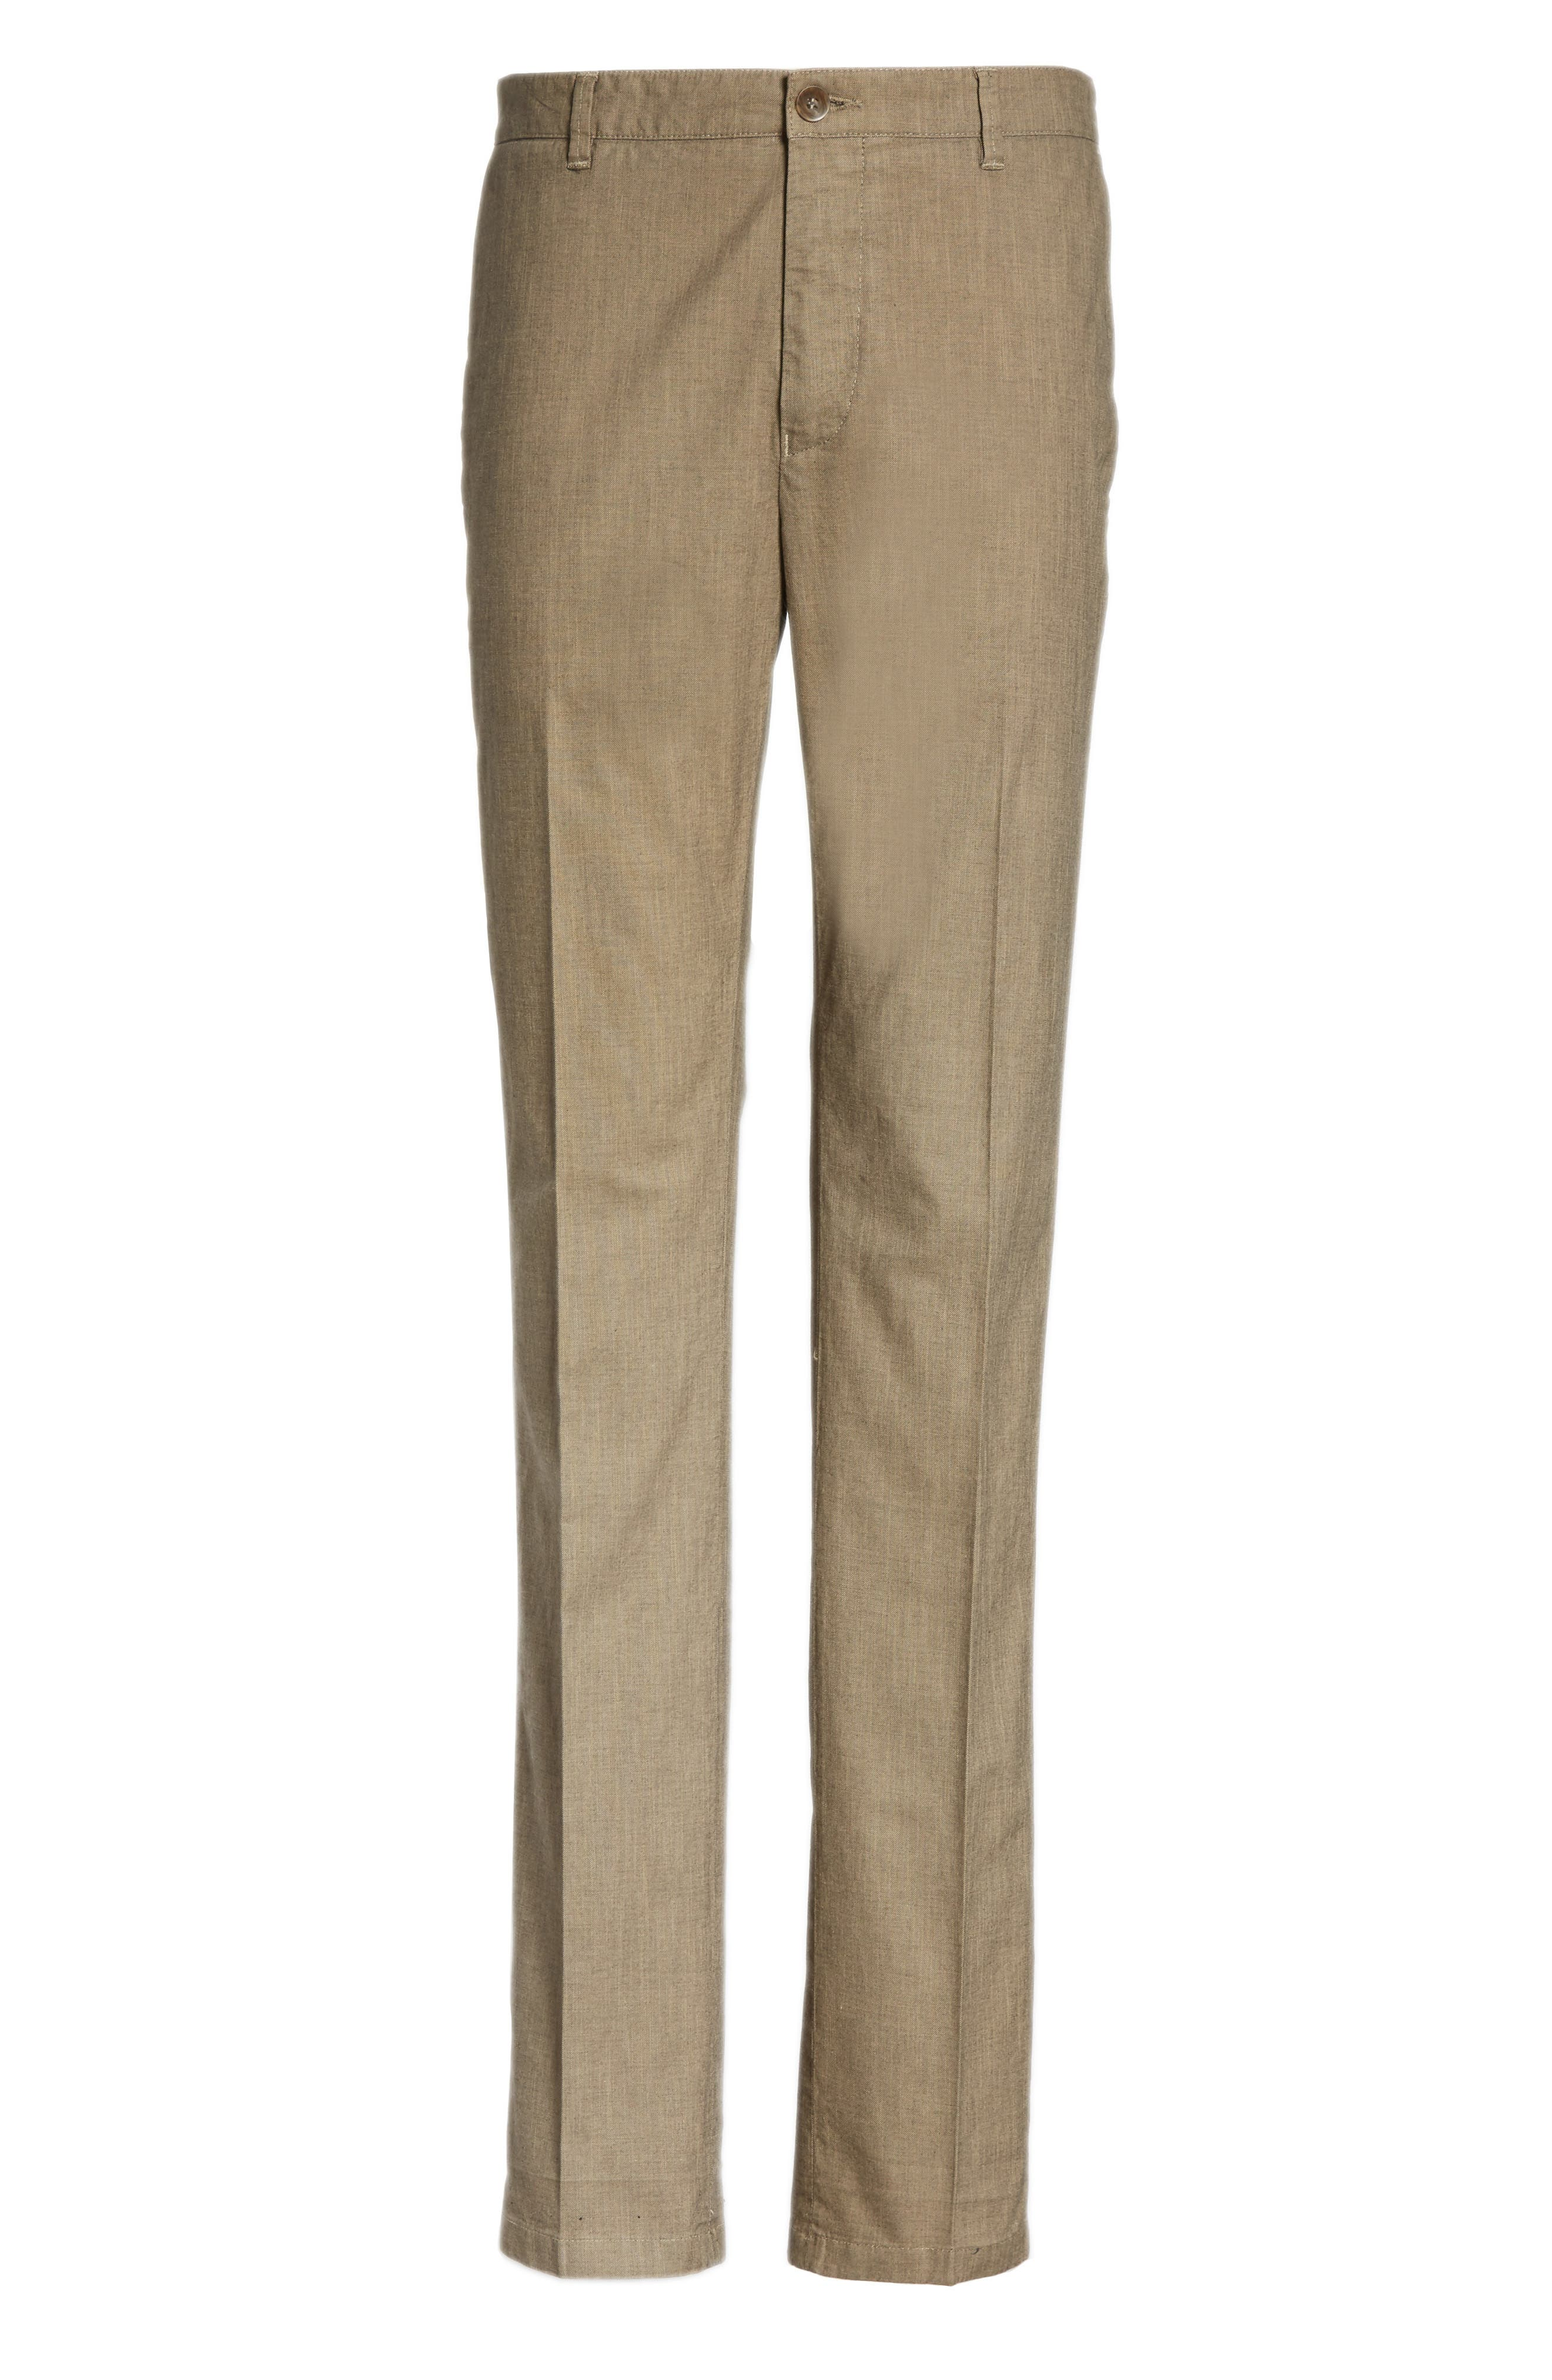 French Pocket Stretch Straight Leg Pants,                             Alternate thumbnail 6, color,                             251